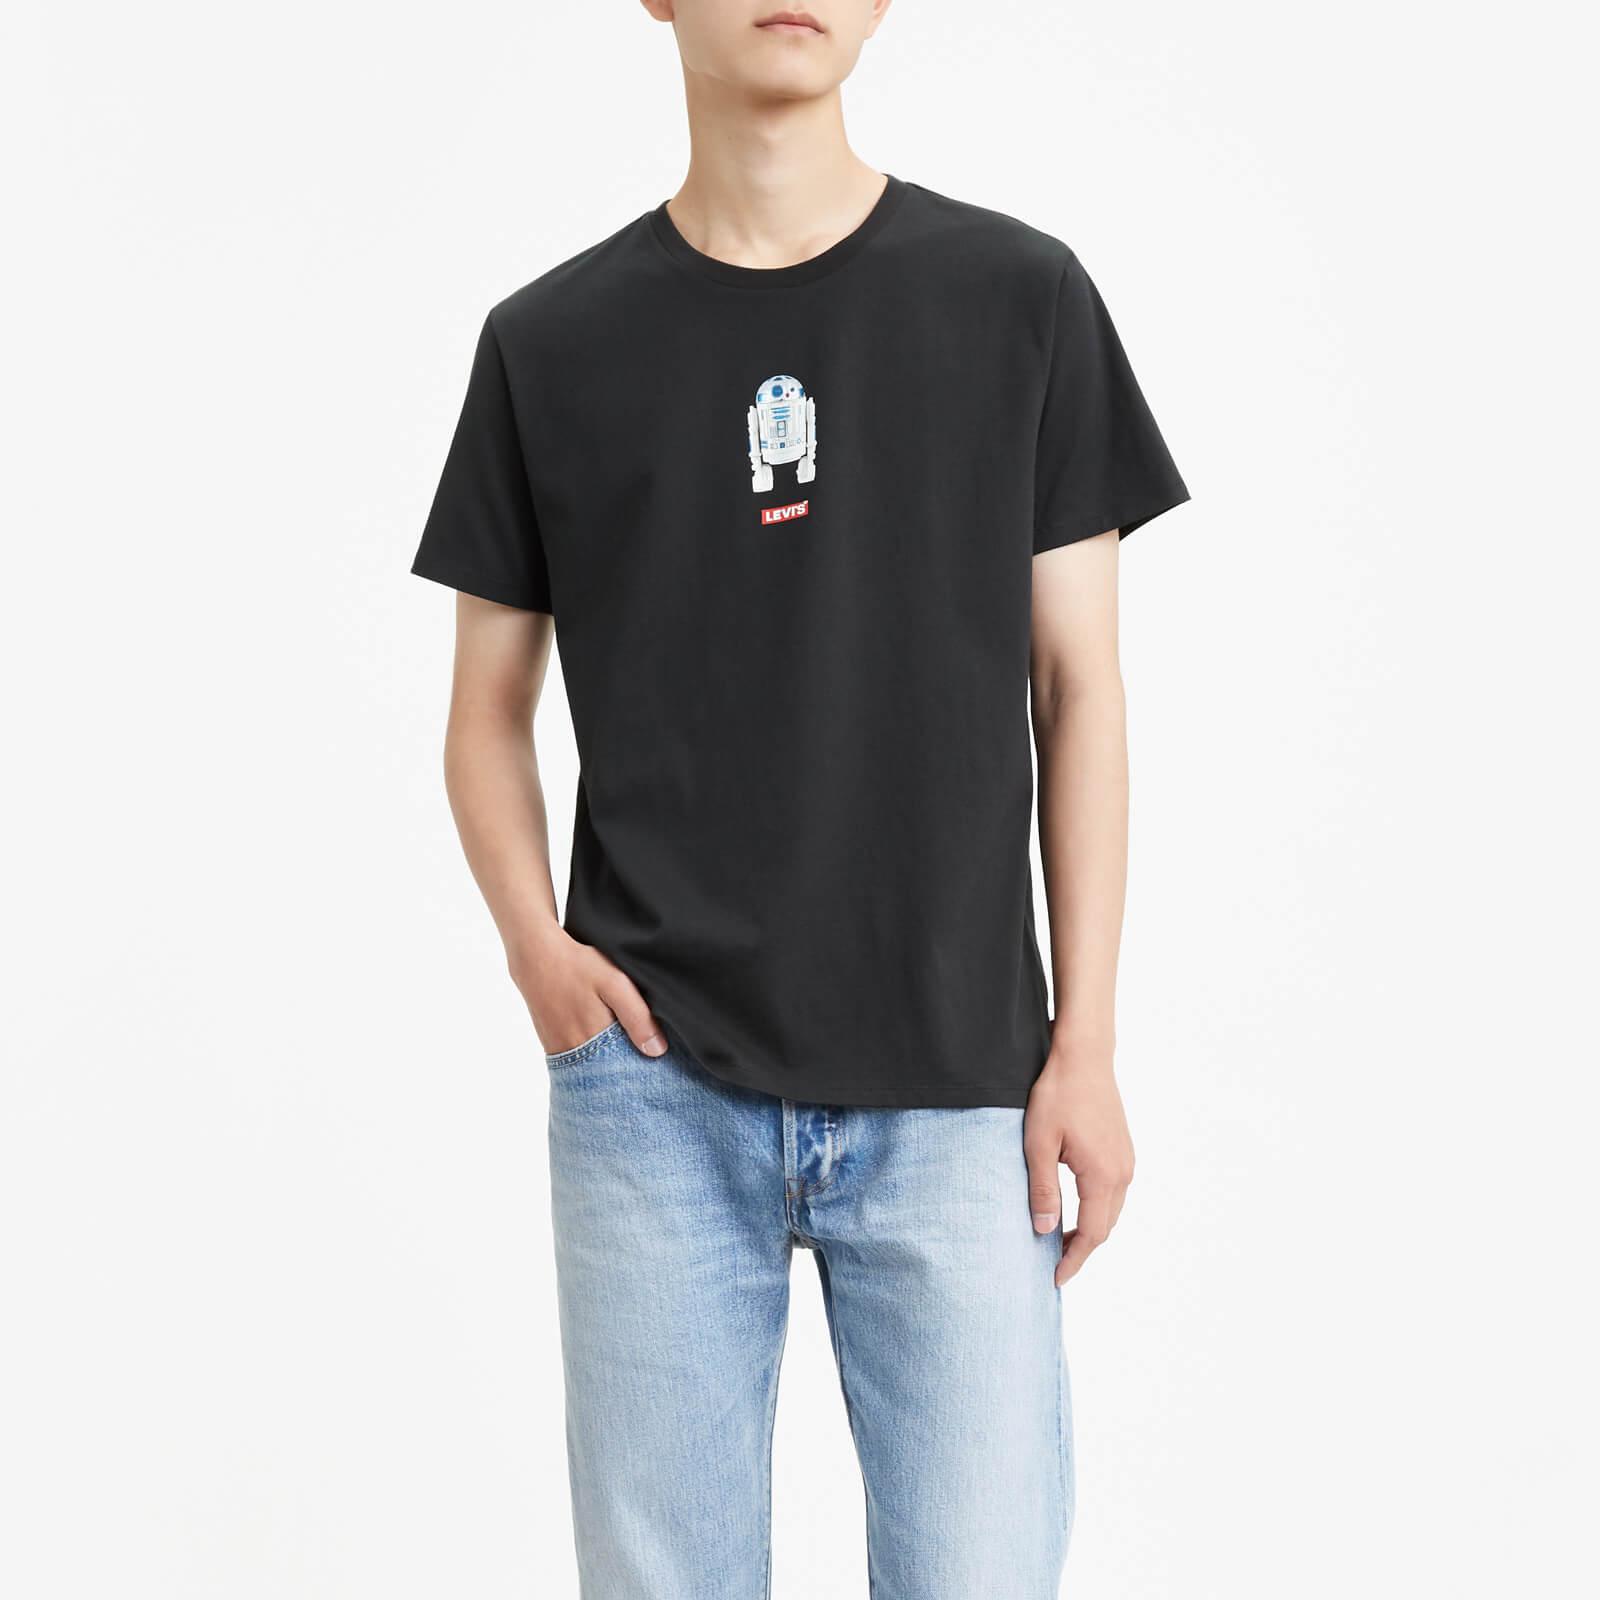 Levi's Star Wars Men's Graphic Short Sleeve T-Shirt - Black - XS